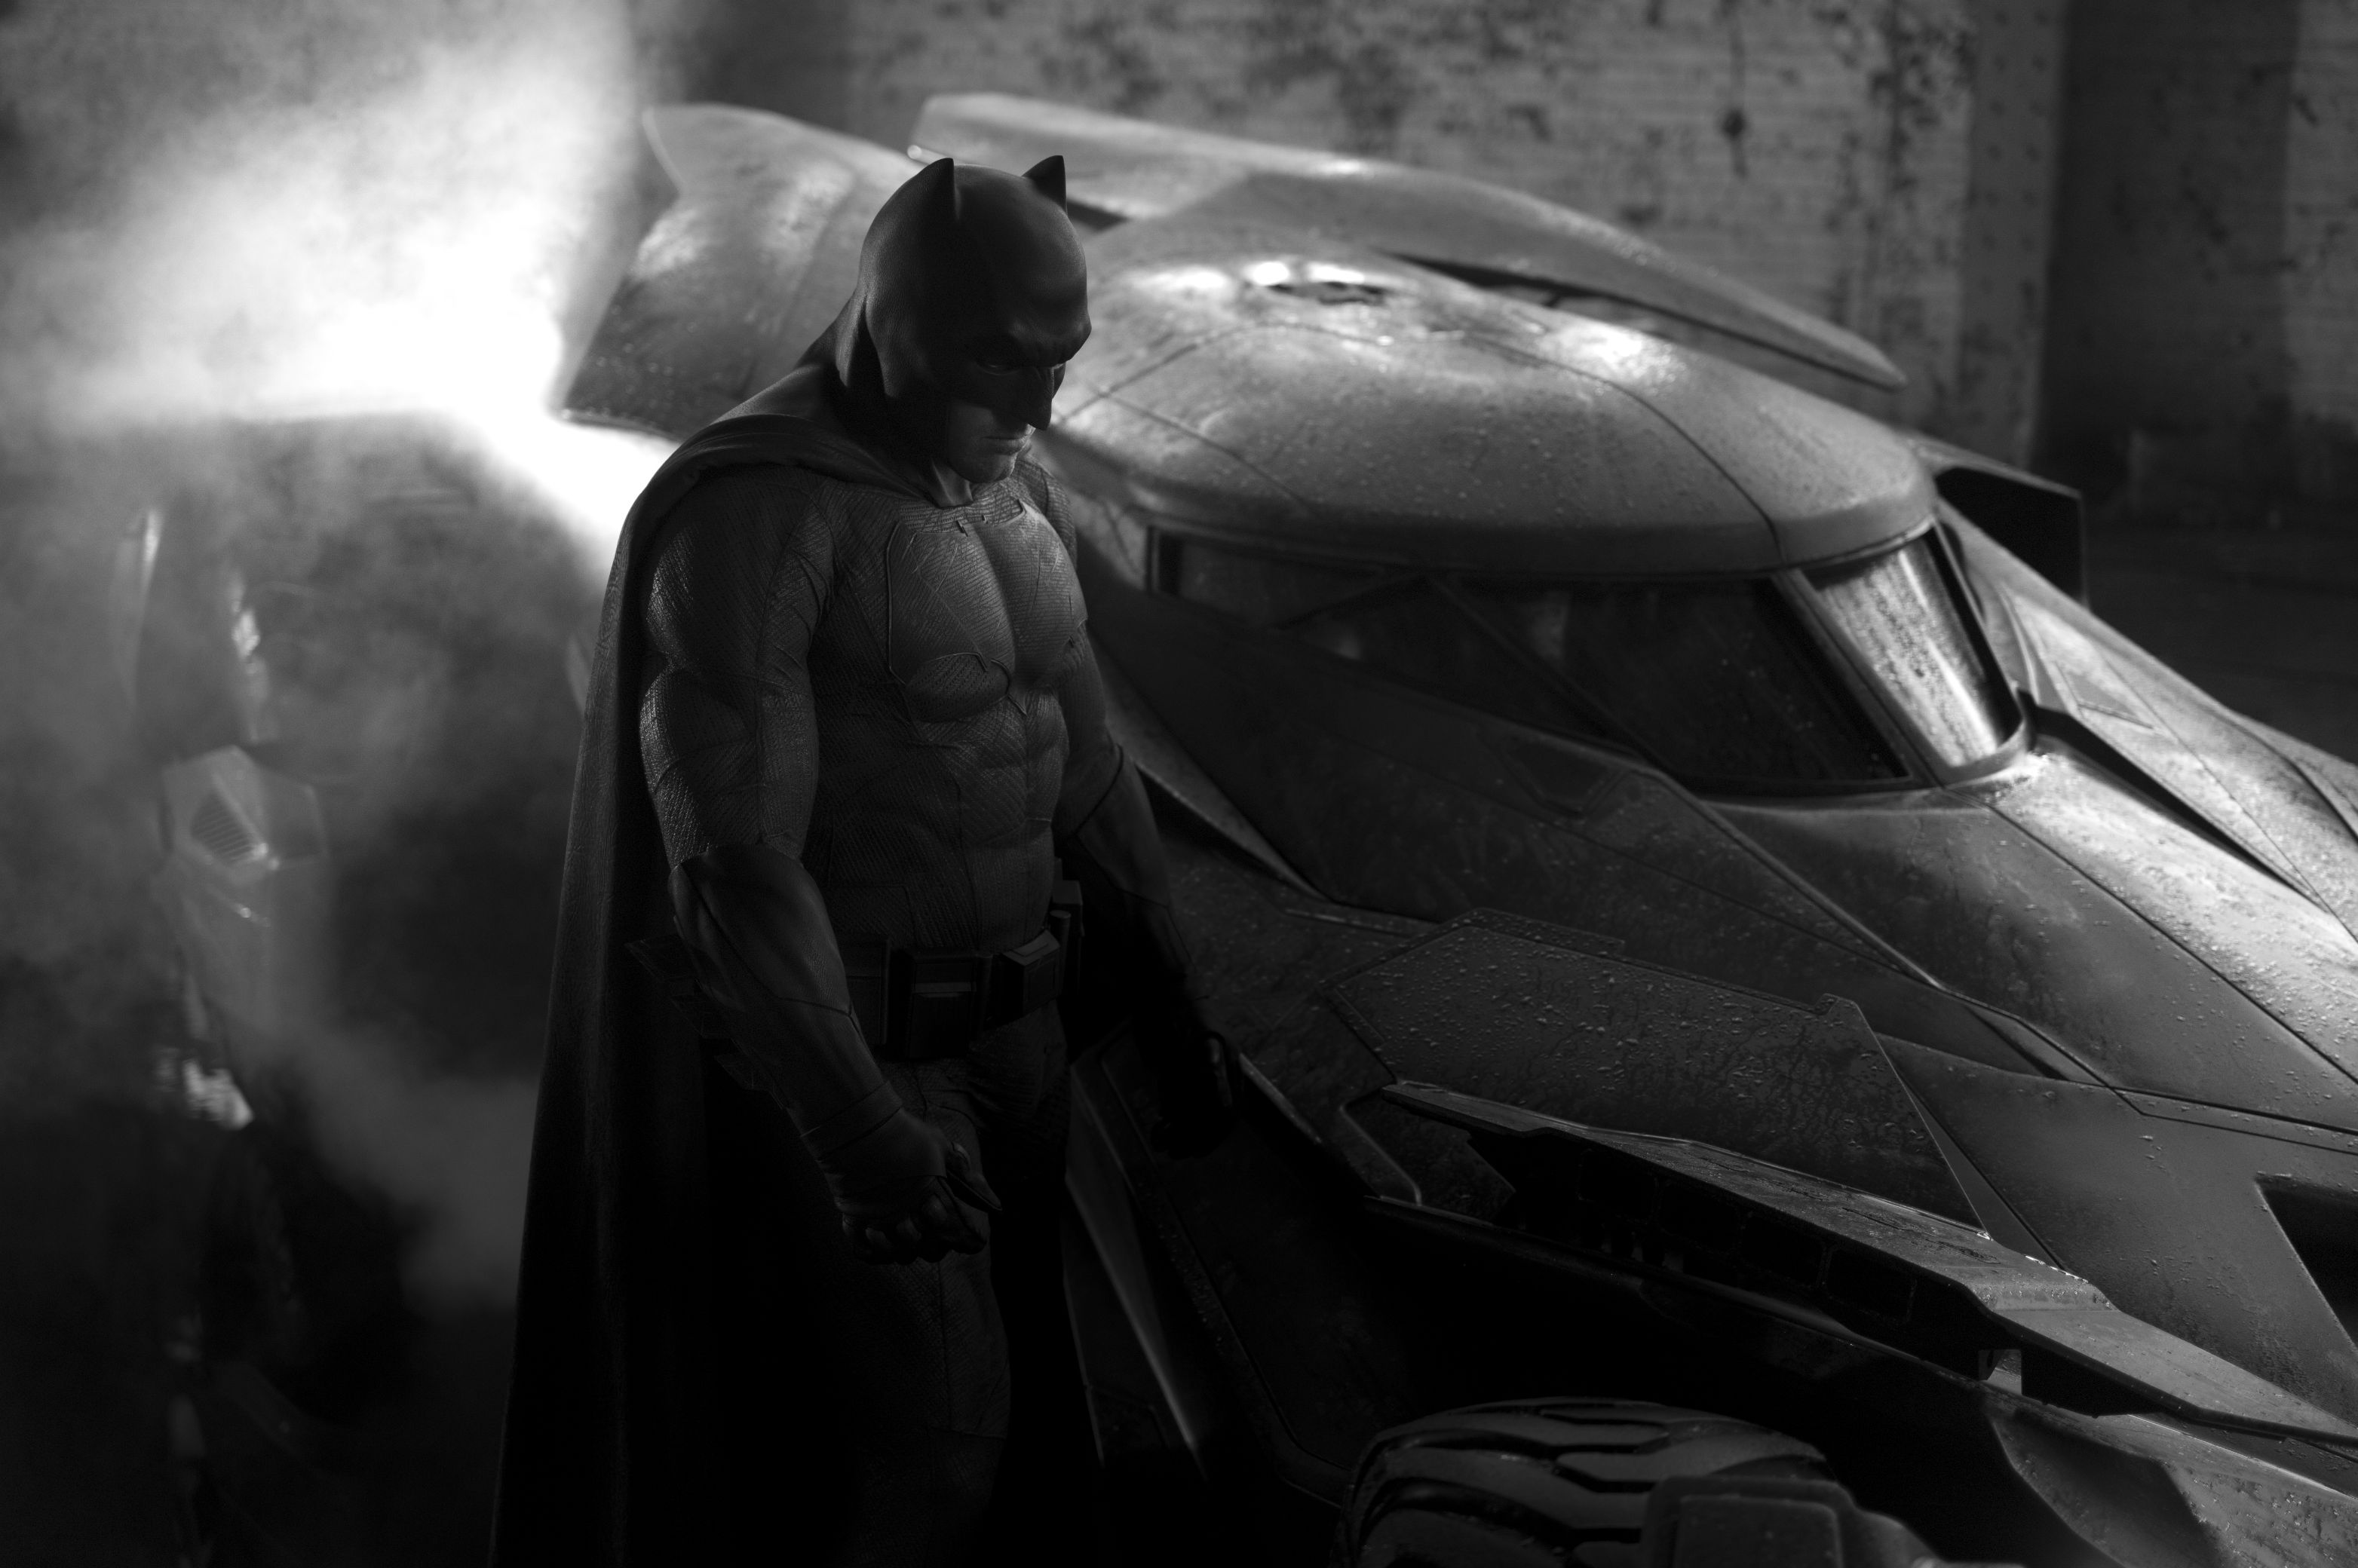 http://www.themarysue.com/wp-content/uploads/2014/05/BatmanAffleckBatmobile.jpg